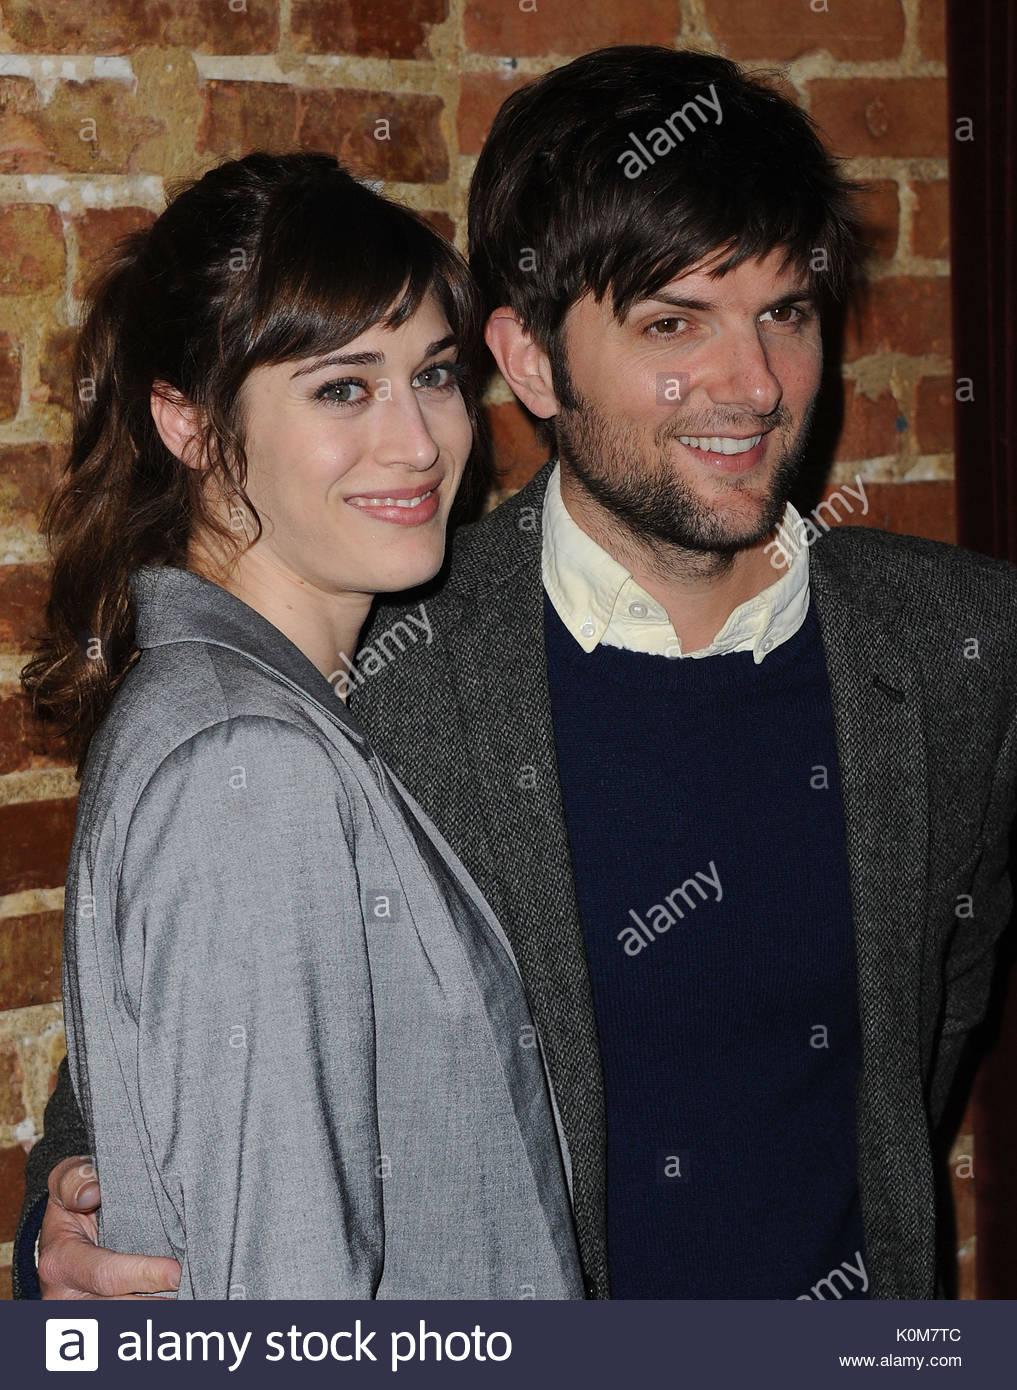 Lizzy caplan dating adam scott